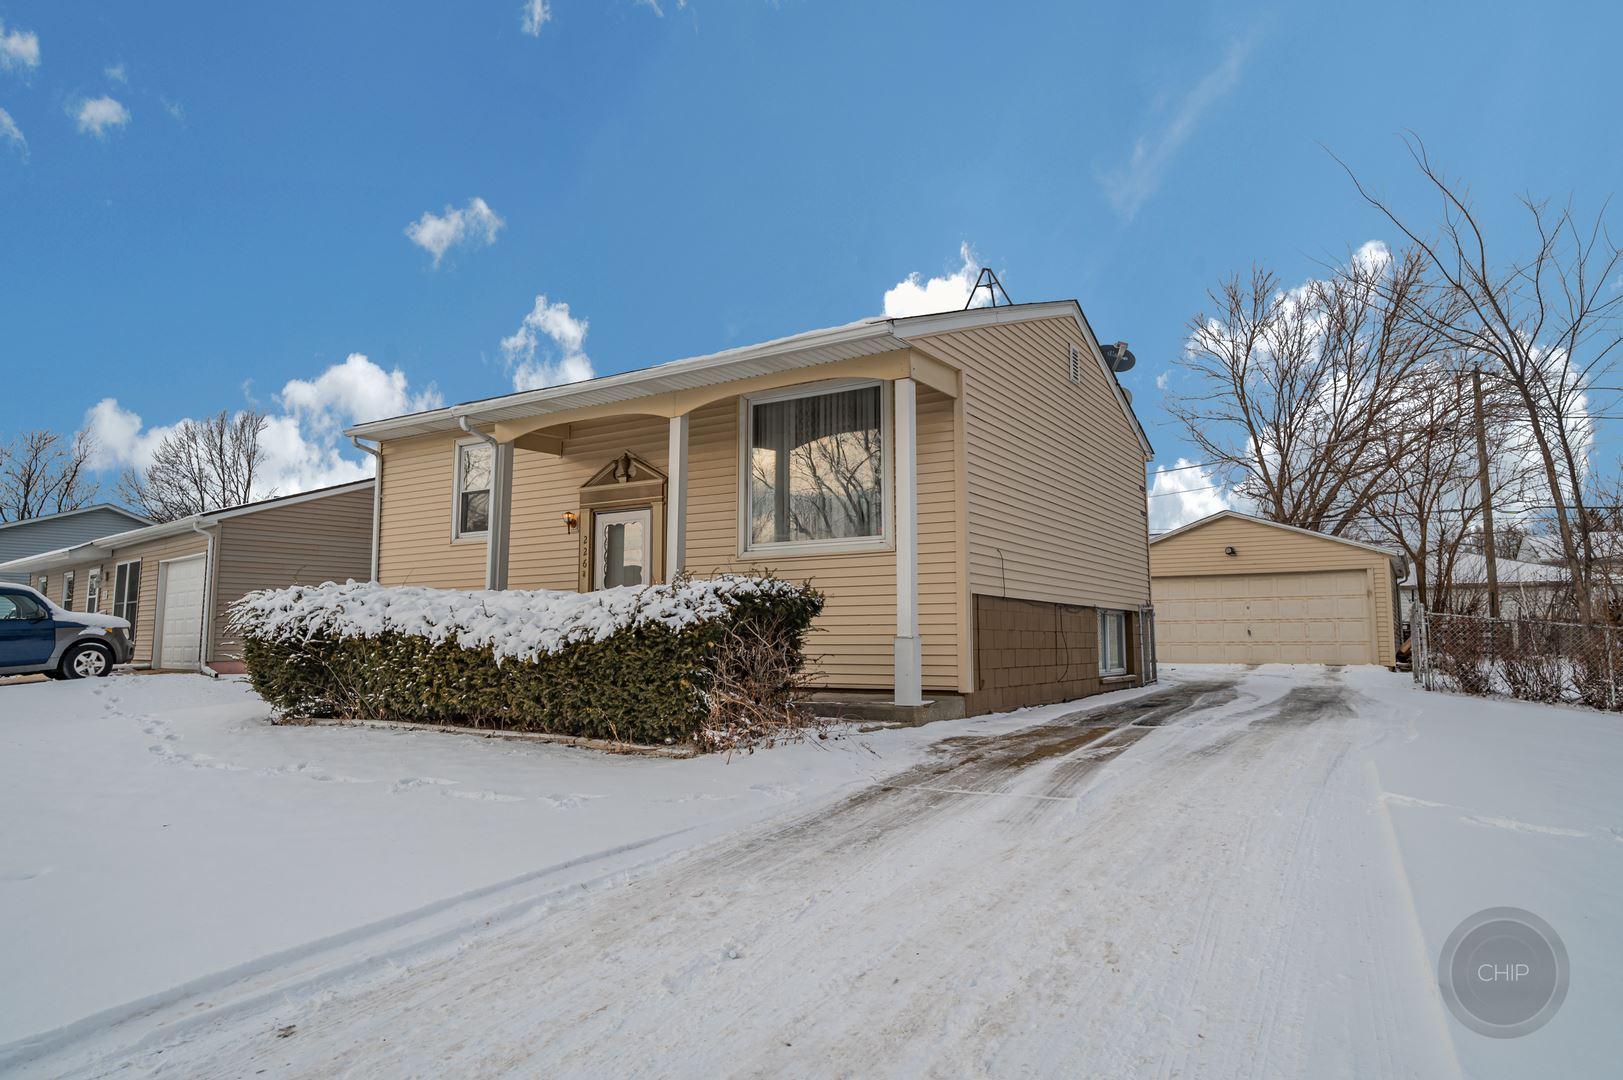 Photo of 226 Karen Avenue, Romeoville, IL 60446 (MLS # 10982196)